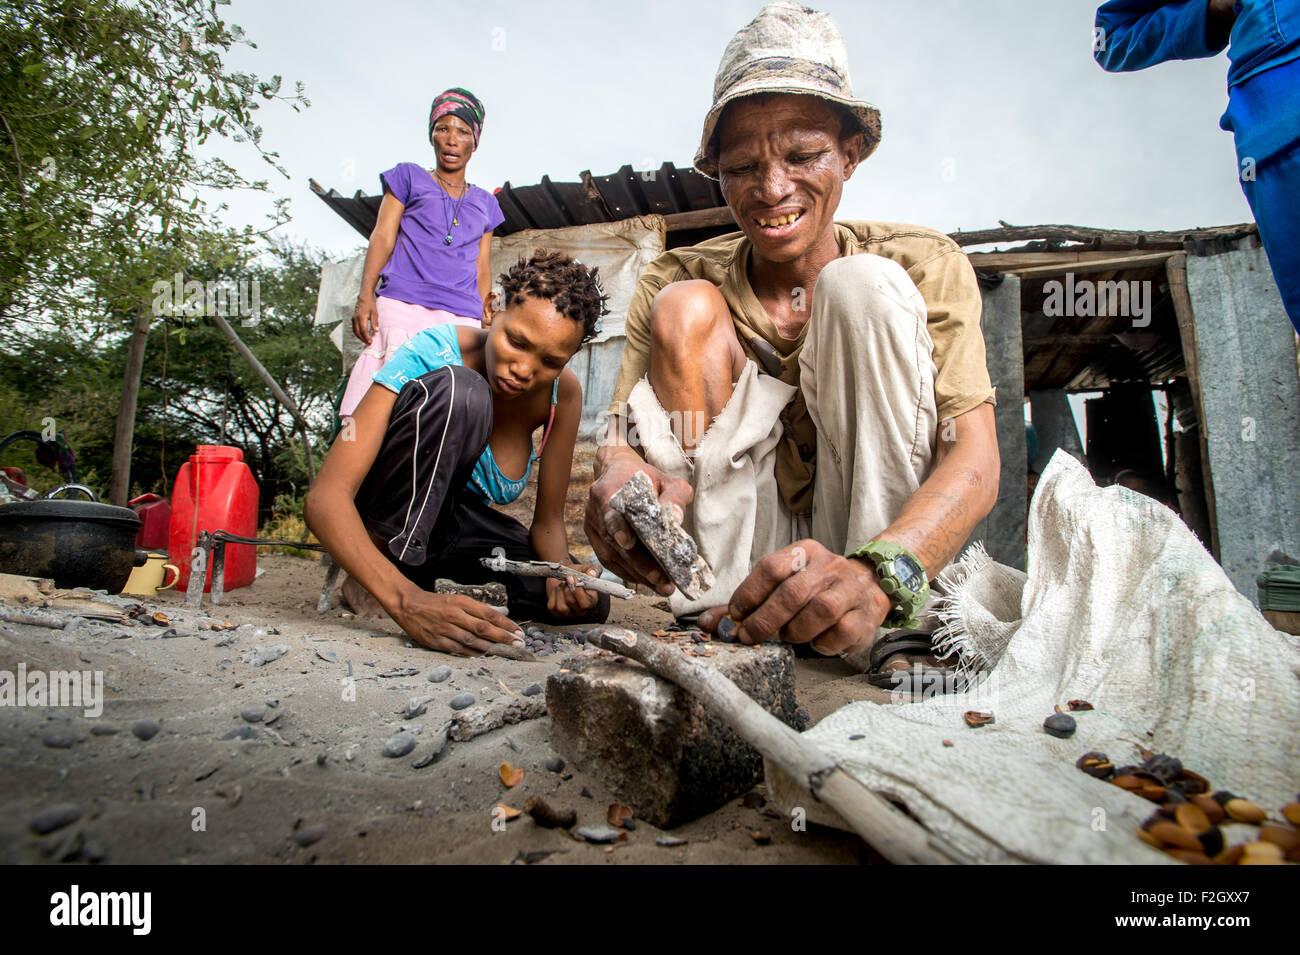 Bushmen or San people preparing food in Botswana, Africa - Stock Image